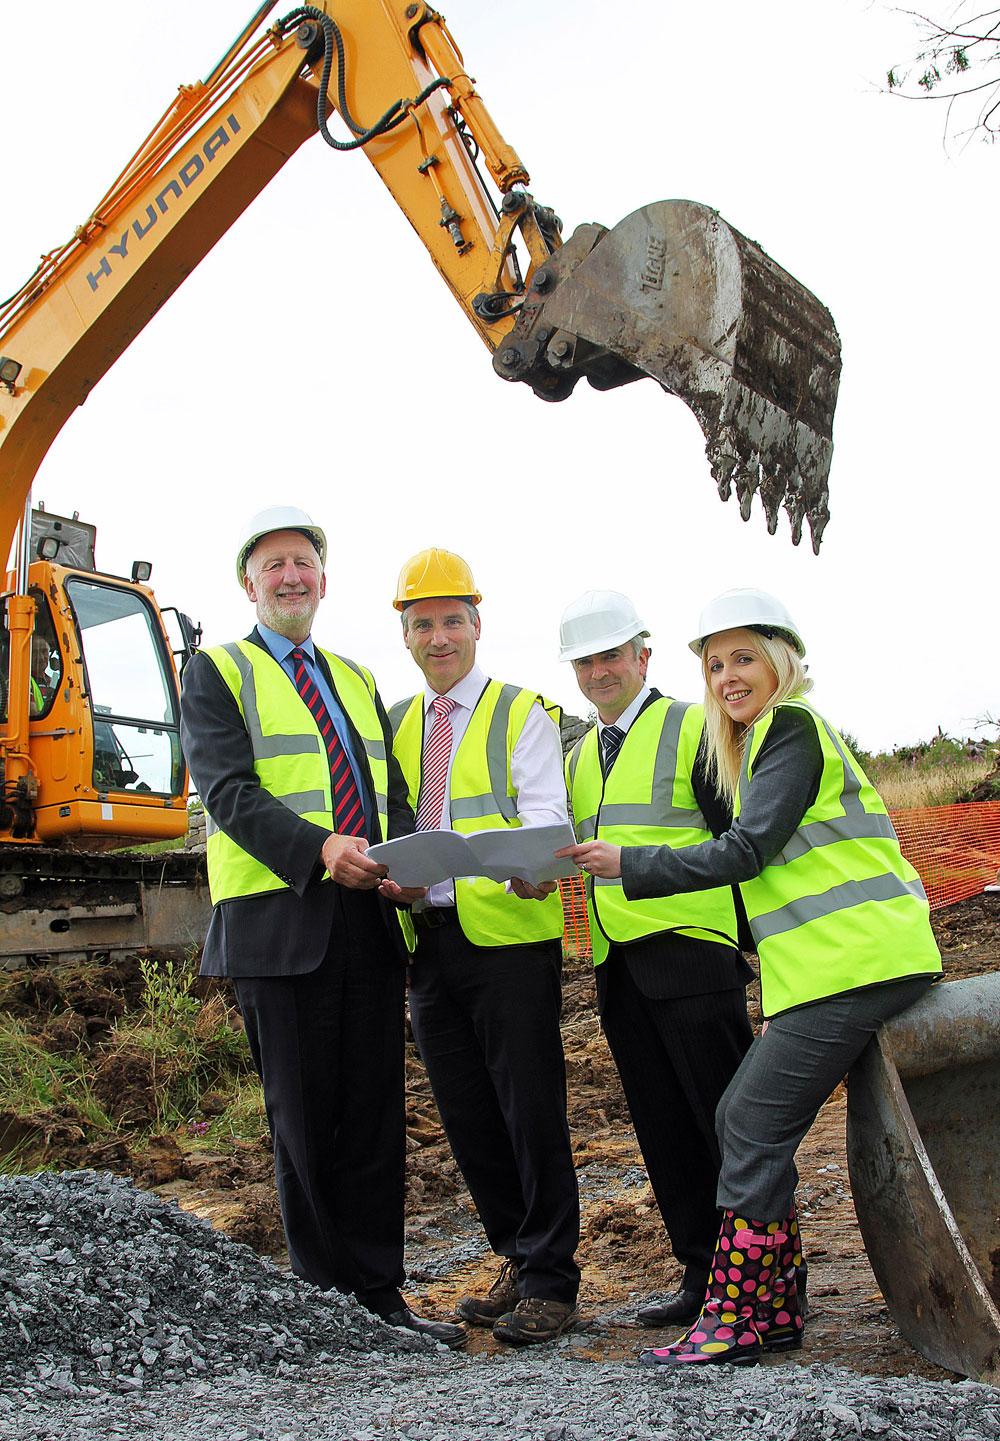 Picture of Coillte and Cavan Burren staff at launch of development